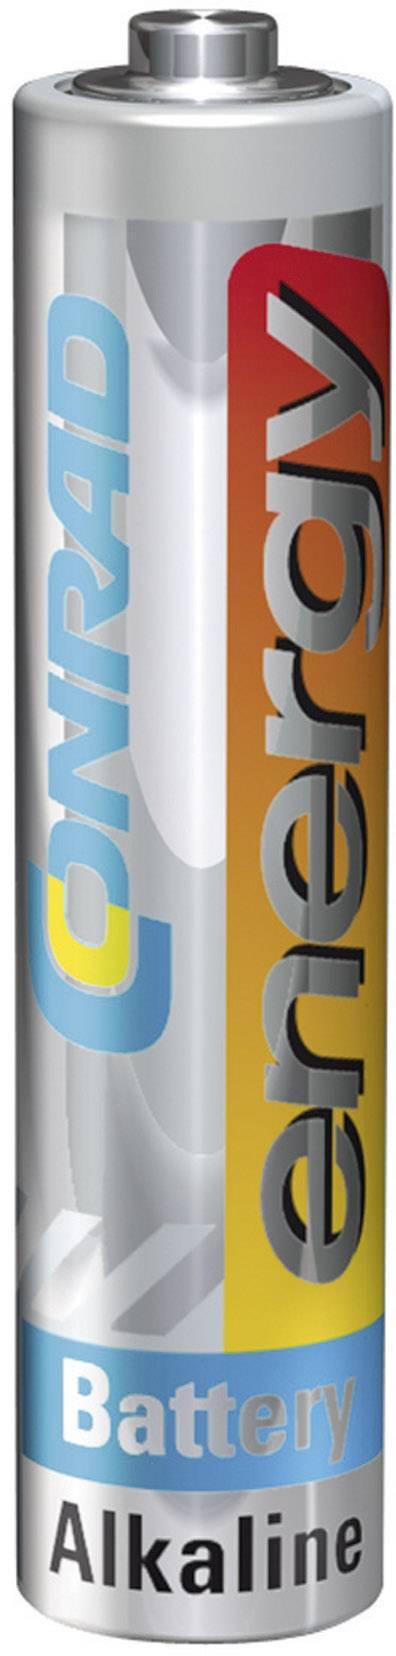 Alkalická baterie Conrad energy, typ AAA